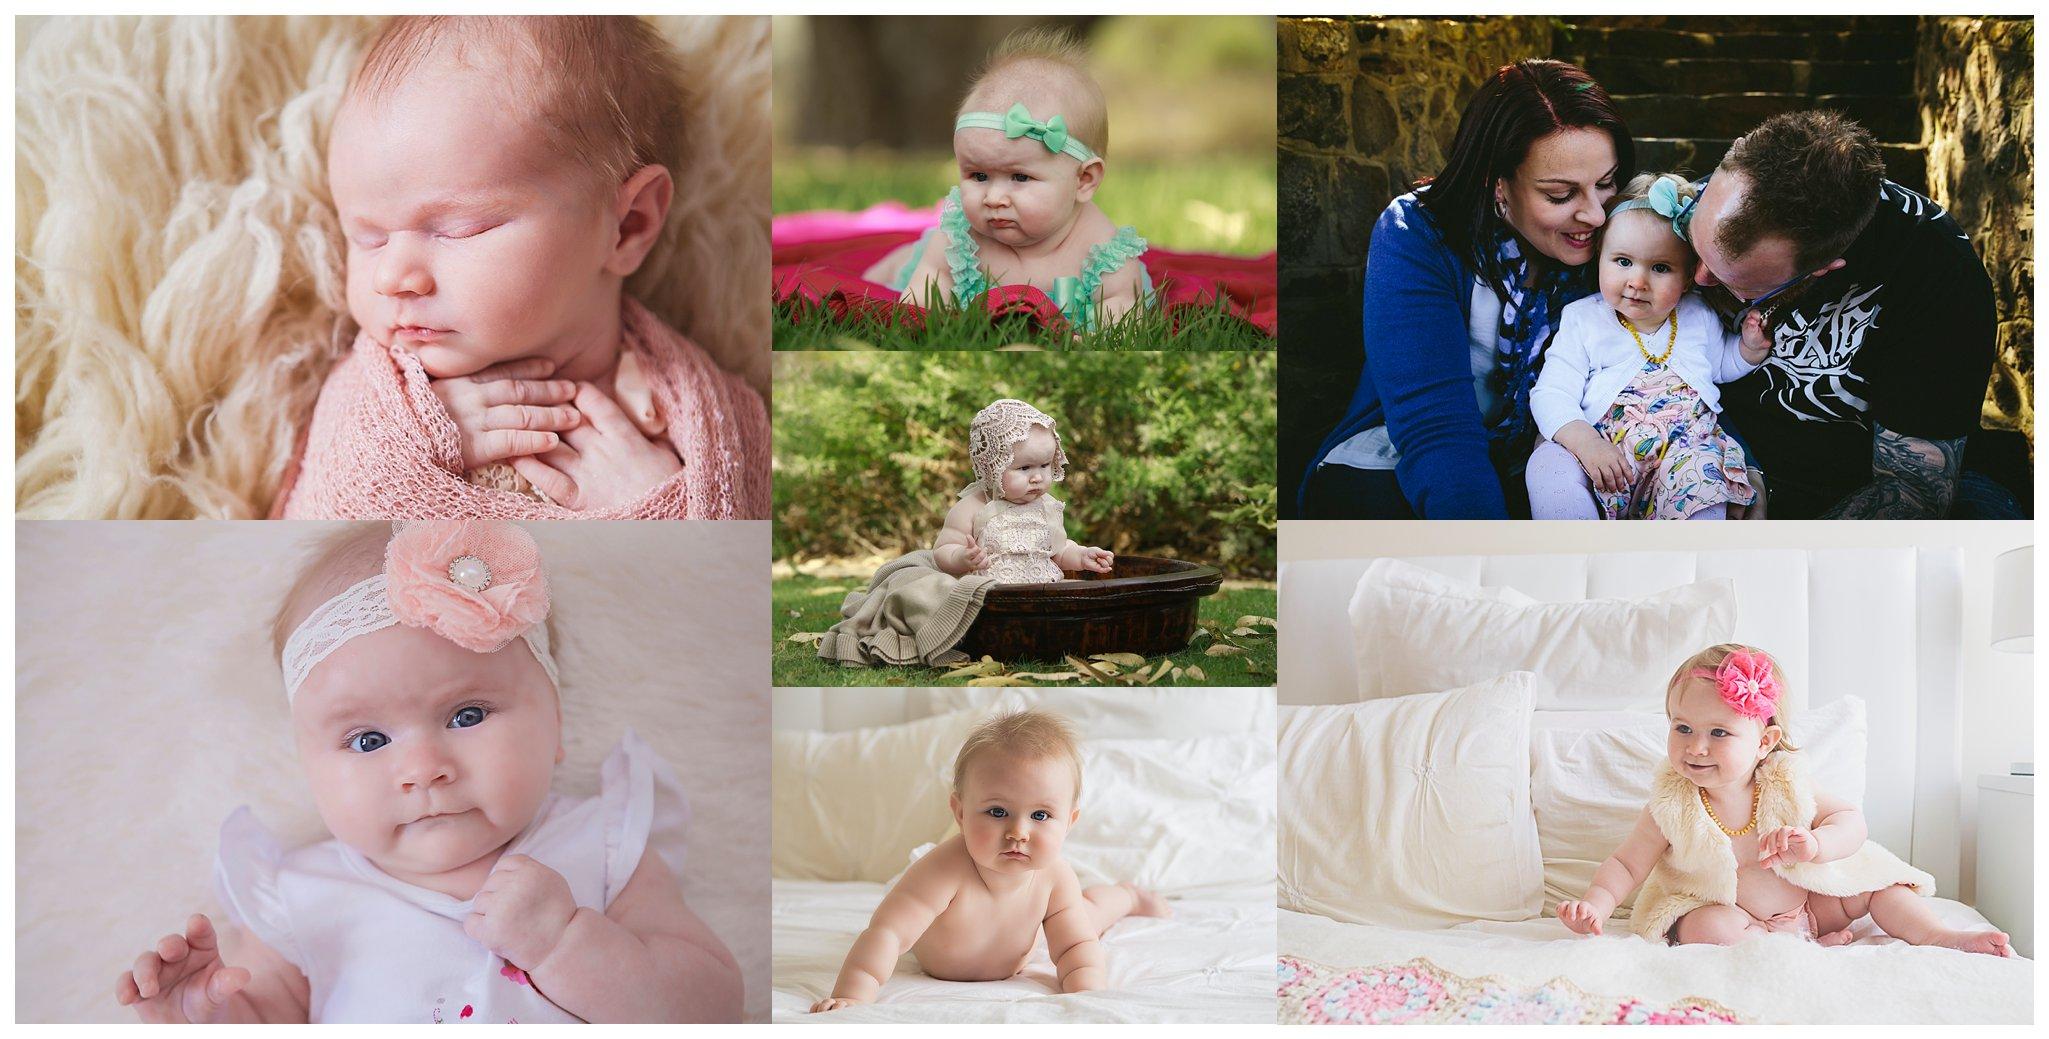 newborn, baby, photo, family, perth, fifth season photography